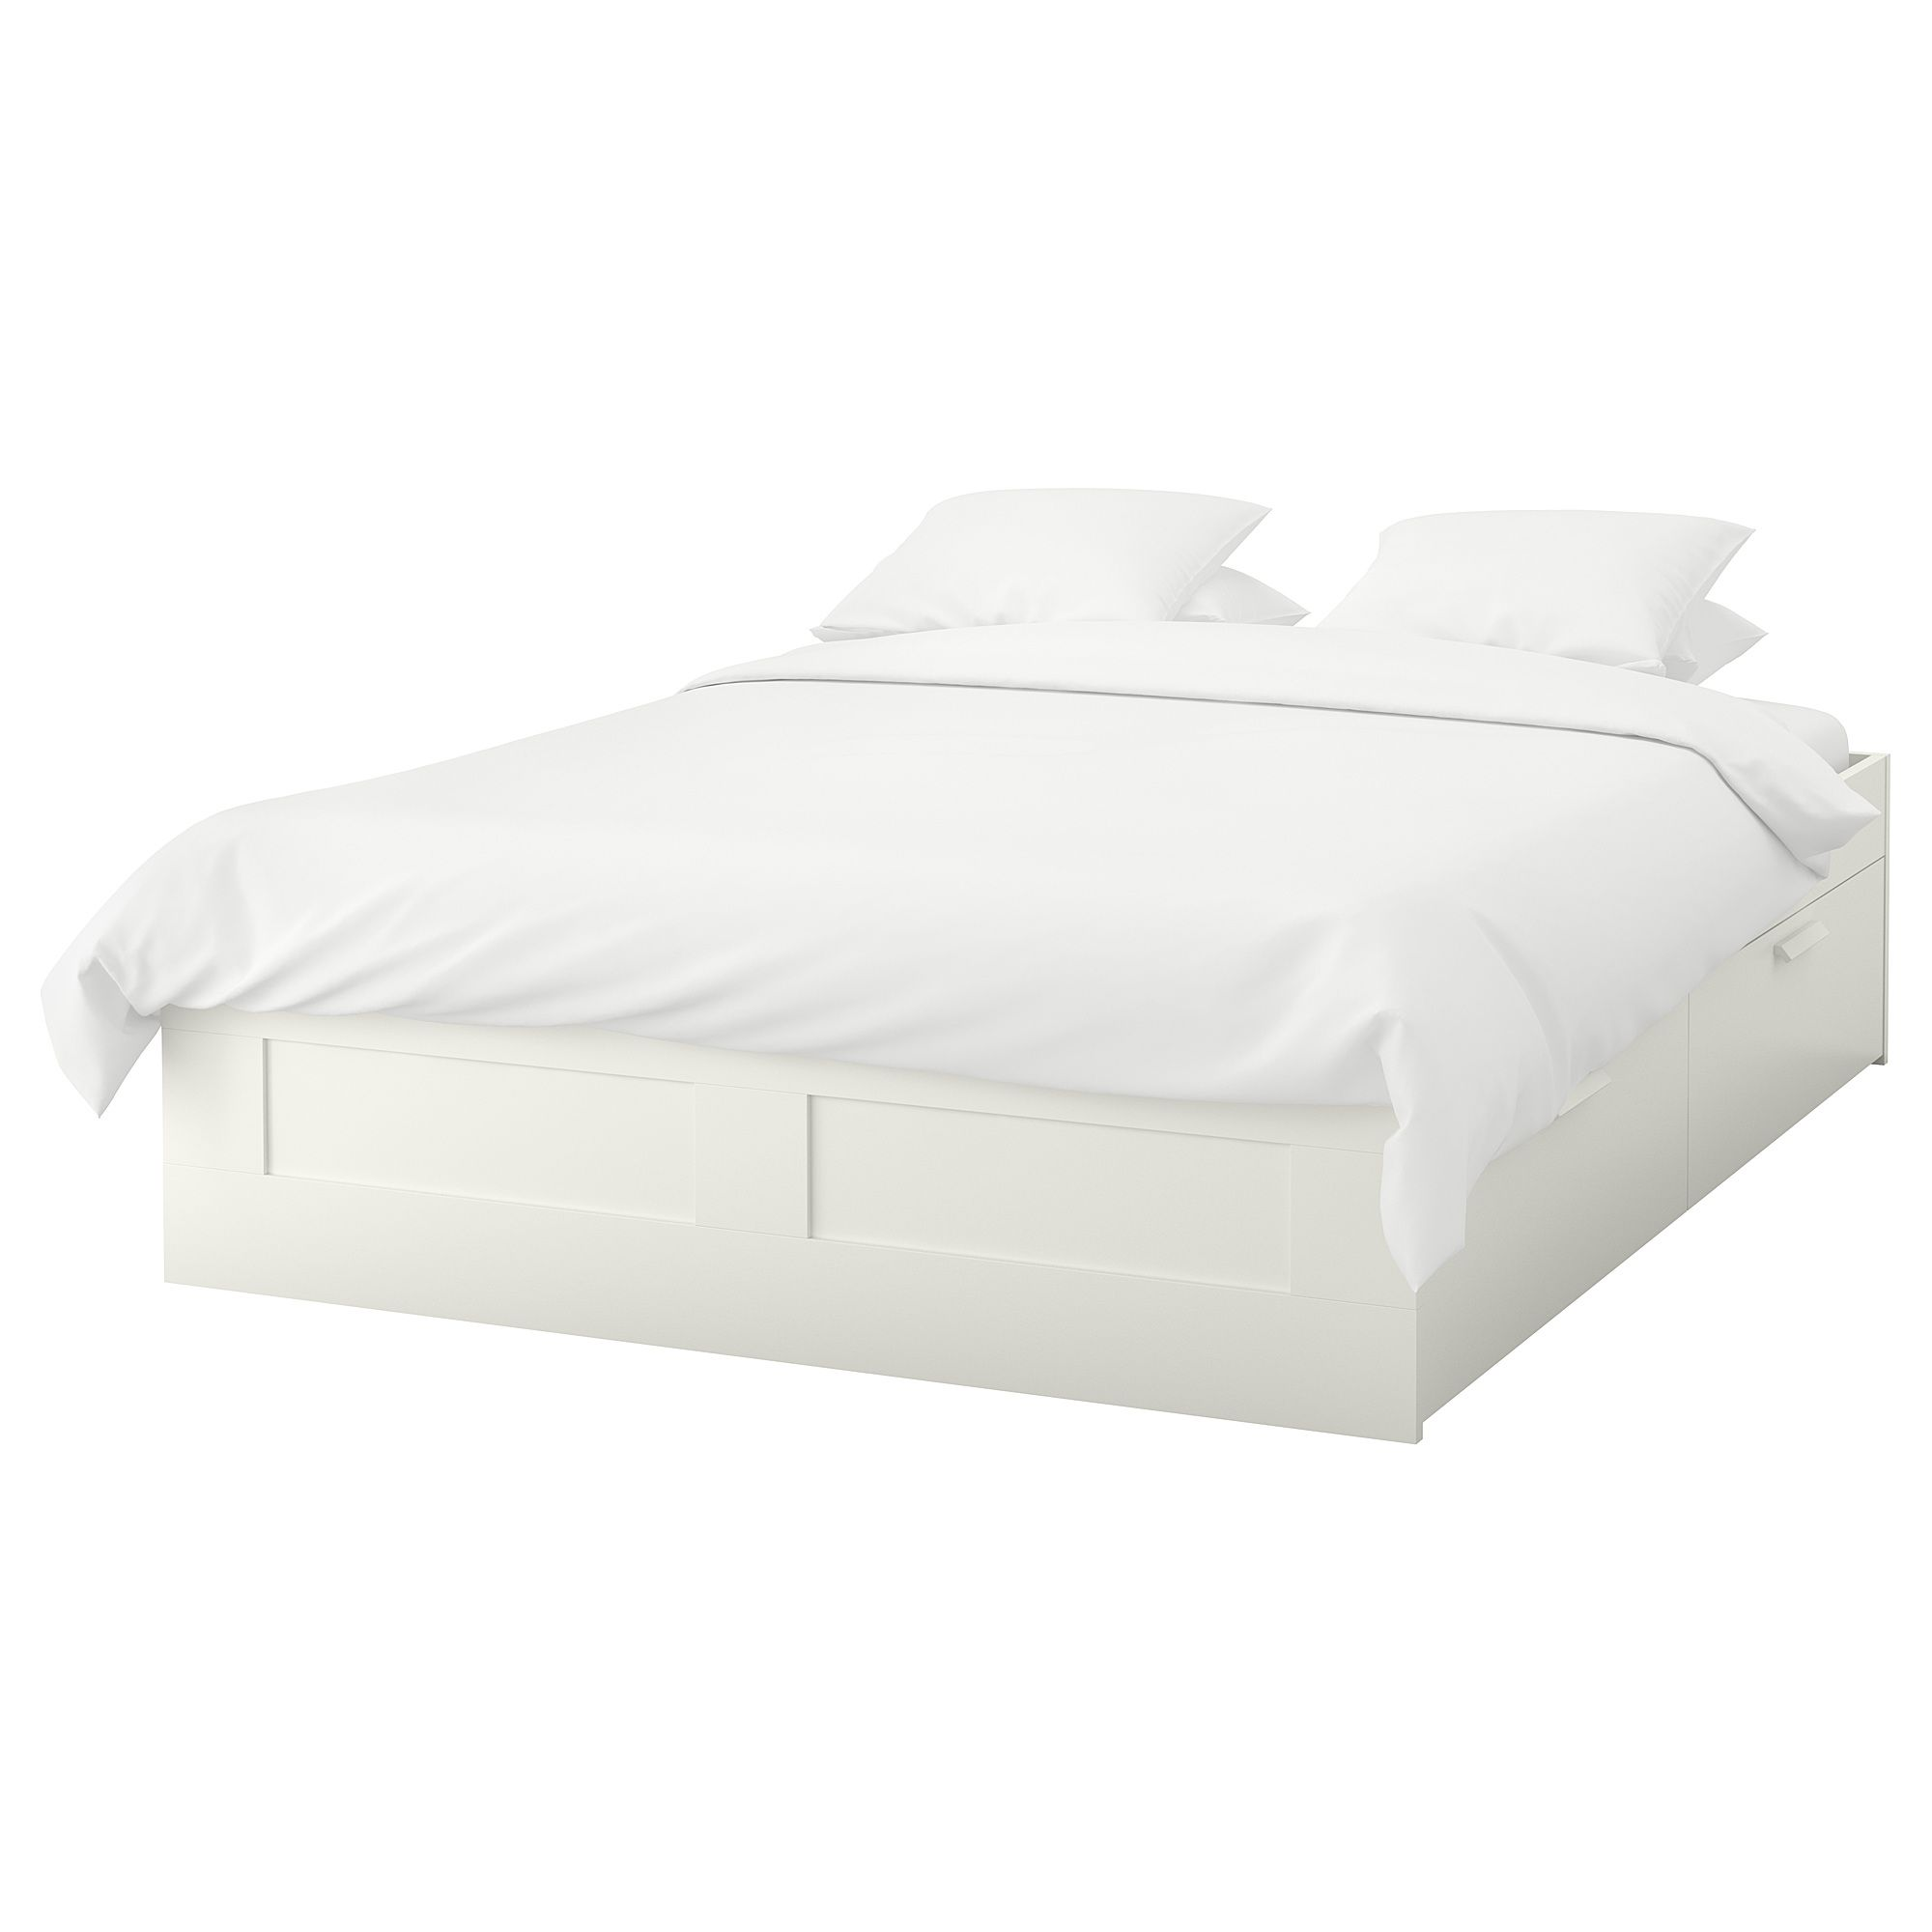 ikea brimnes bed. BRIMNES Bed Frame With Storage - Queen, Luröy IKEA Ikea Brimnes